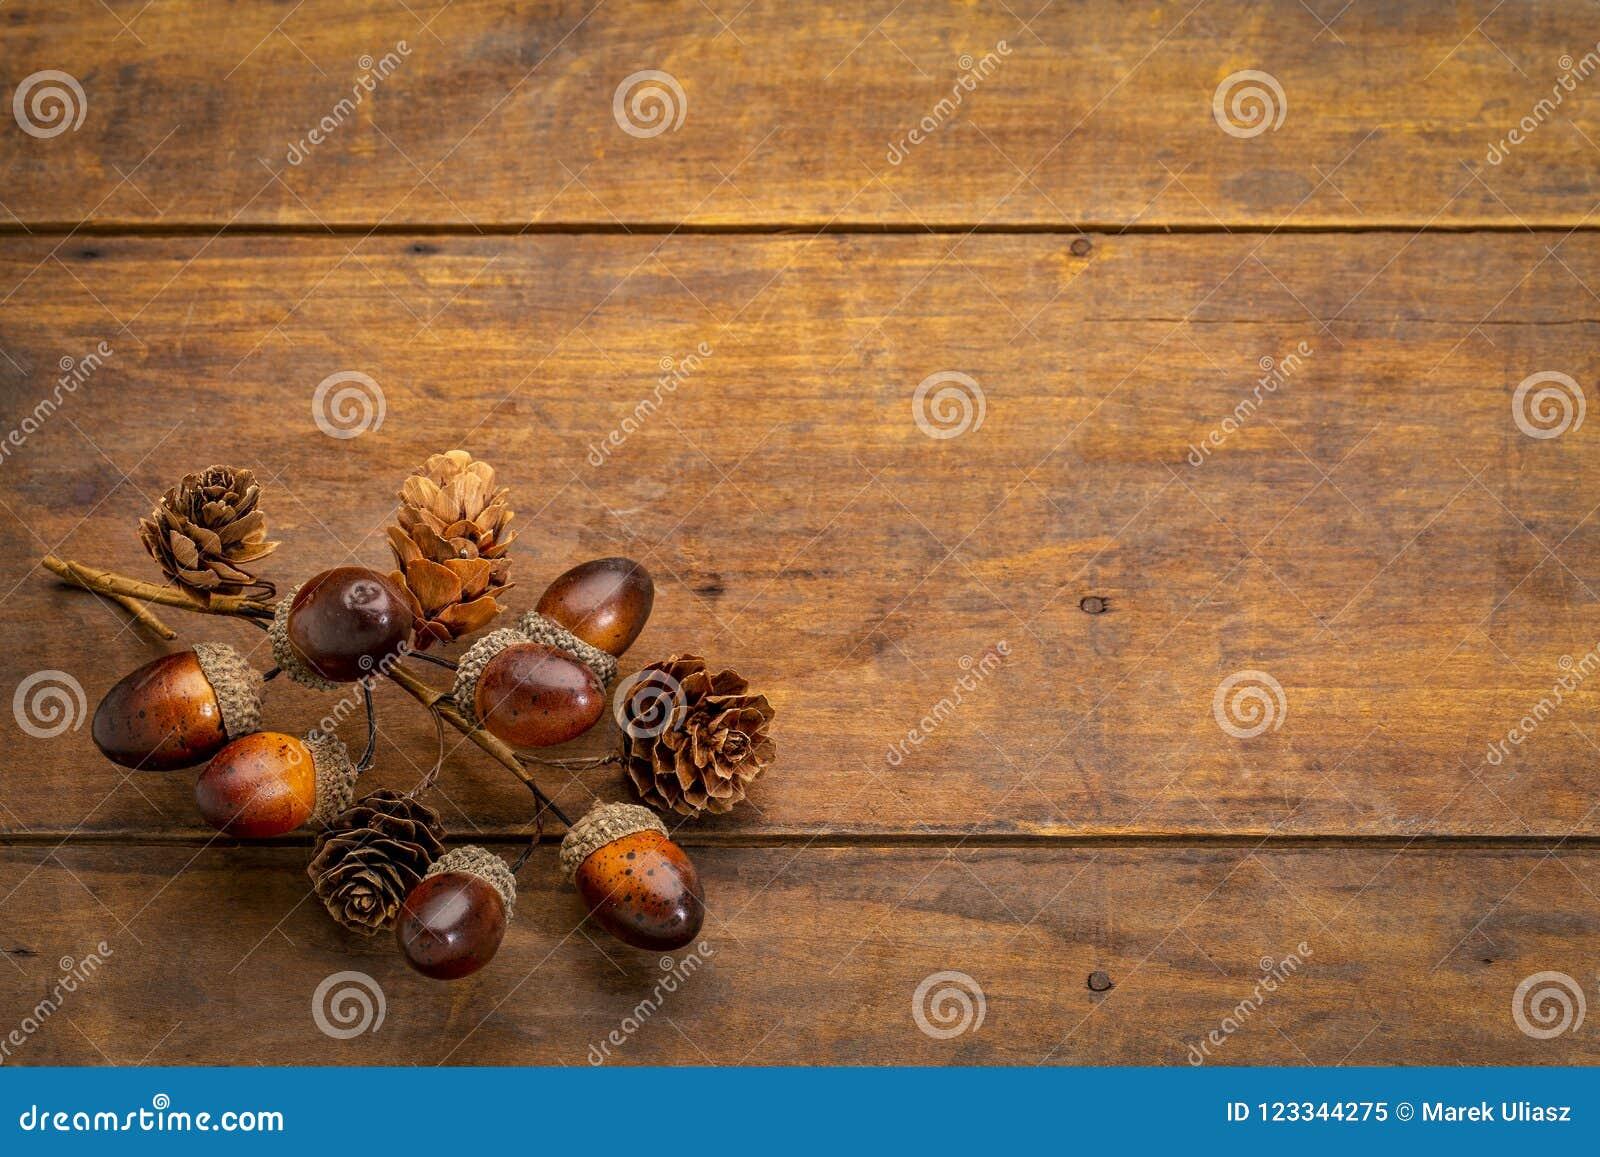 Rustiek grungehout met dalingsdecoratie